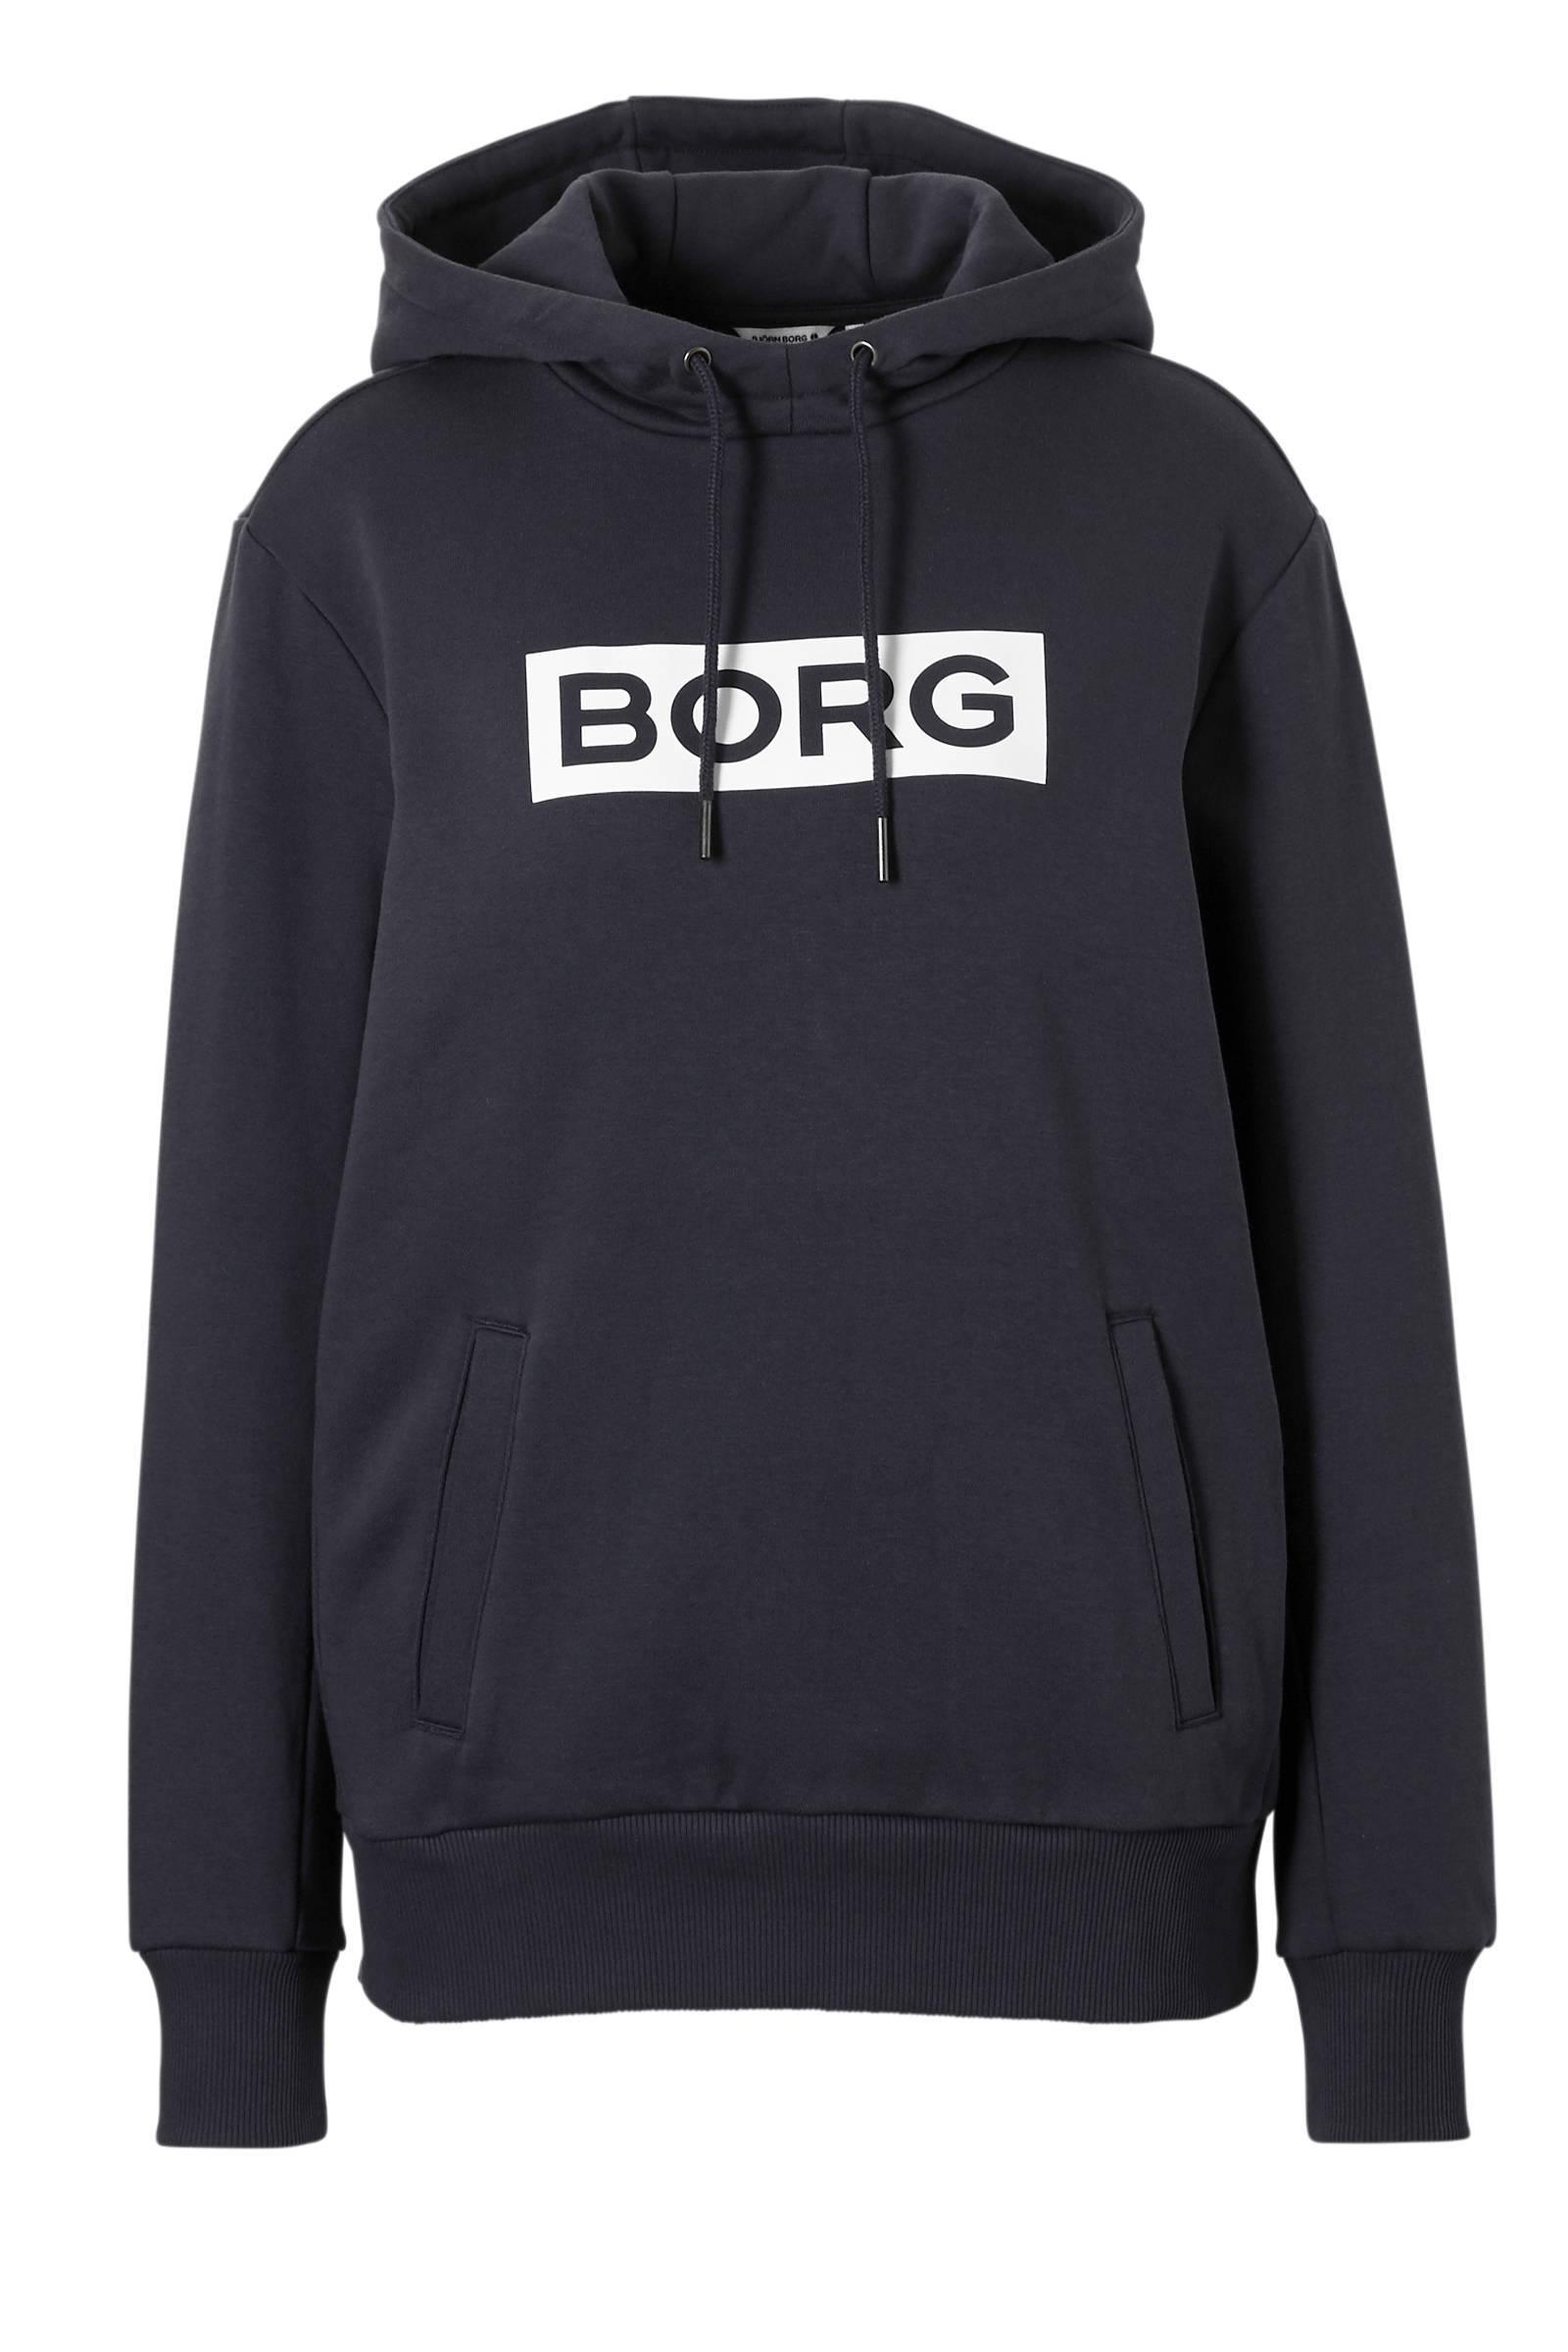 Björn Borg sweater zwart (dames)